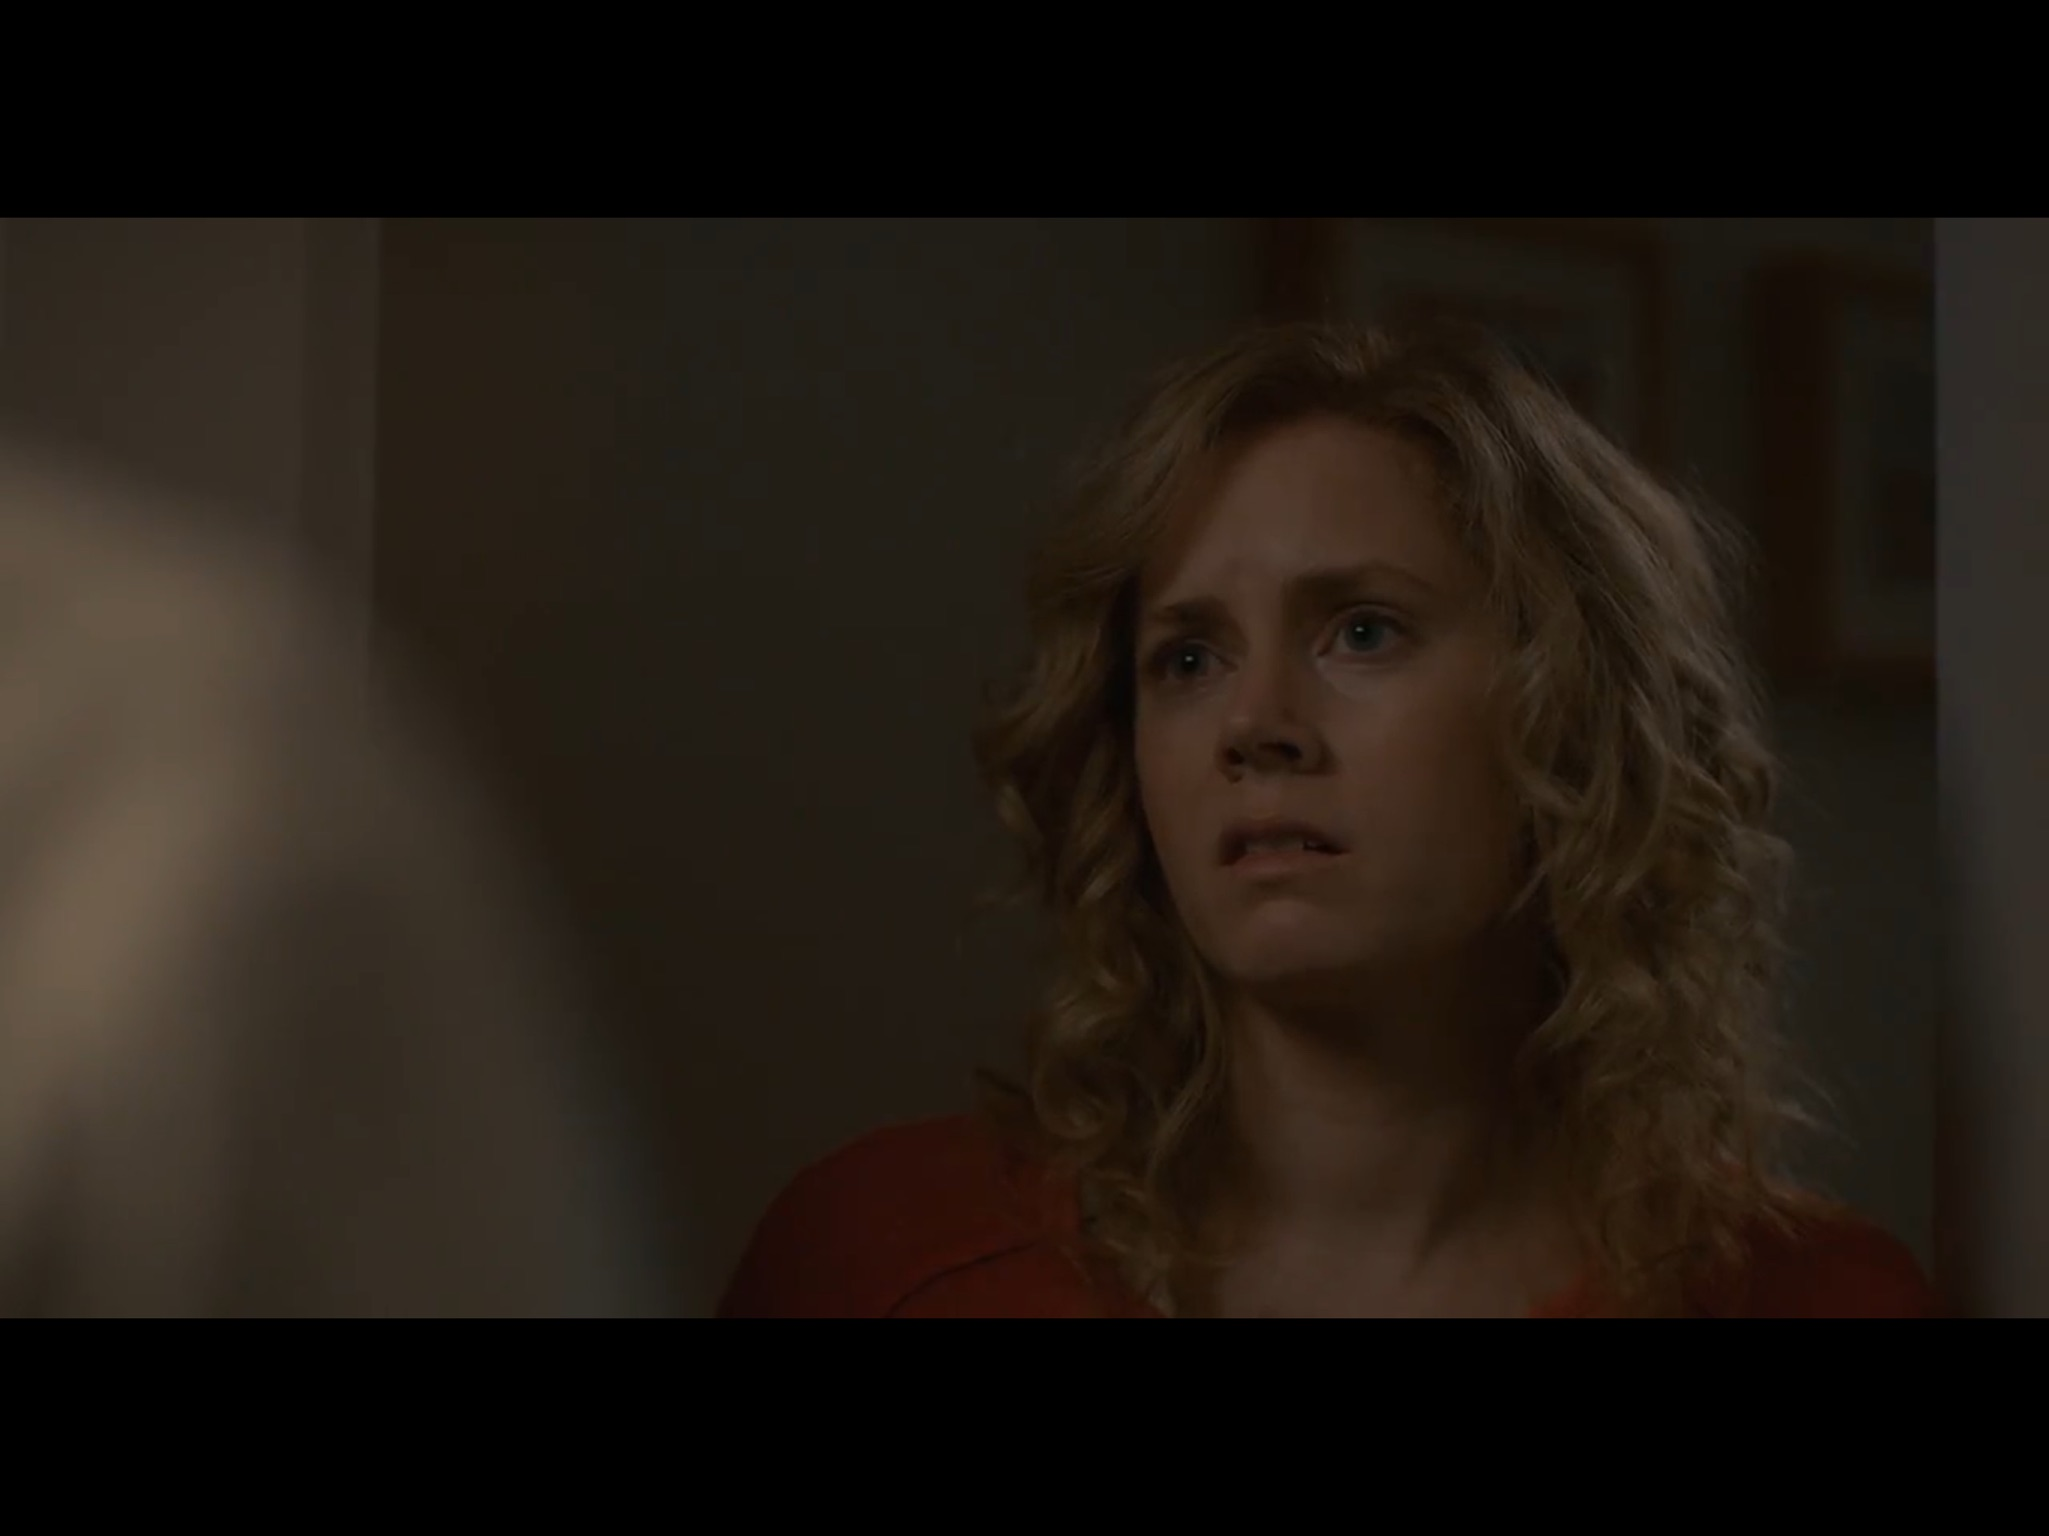 her-movie-2013-screencap-18.JPG